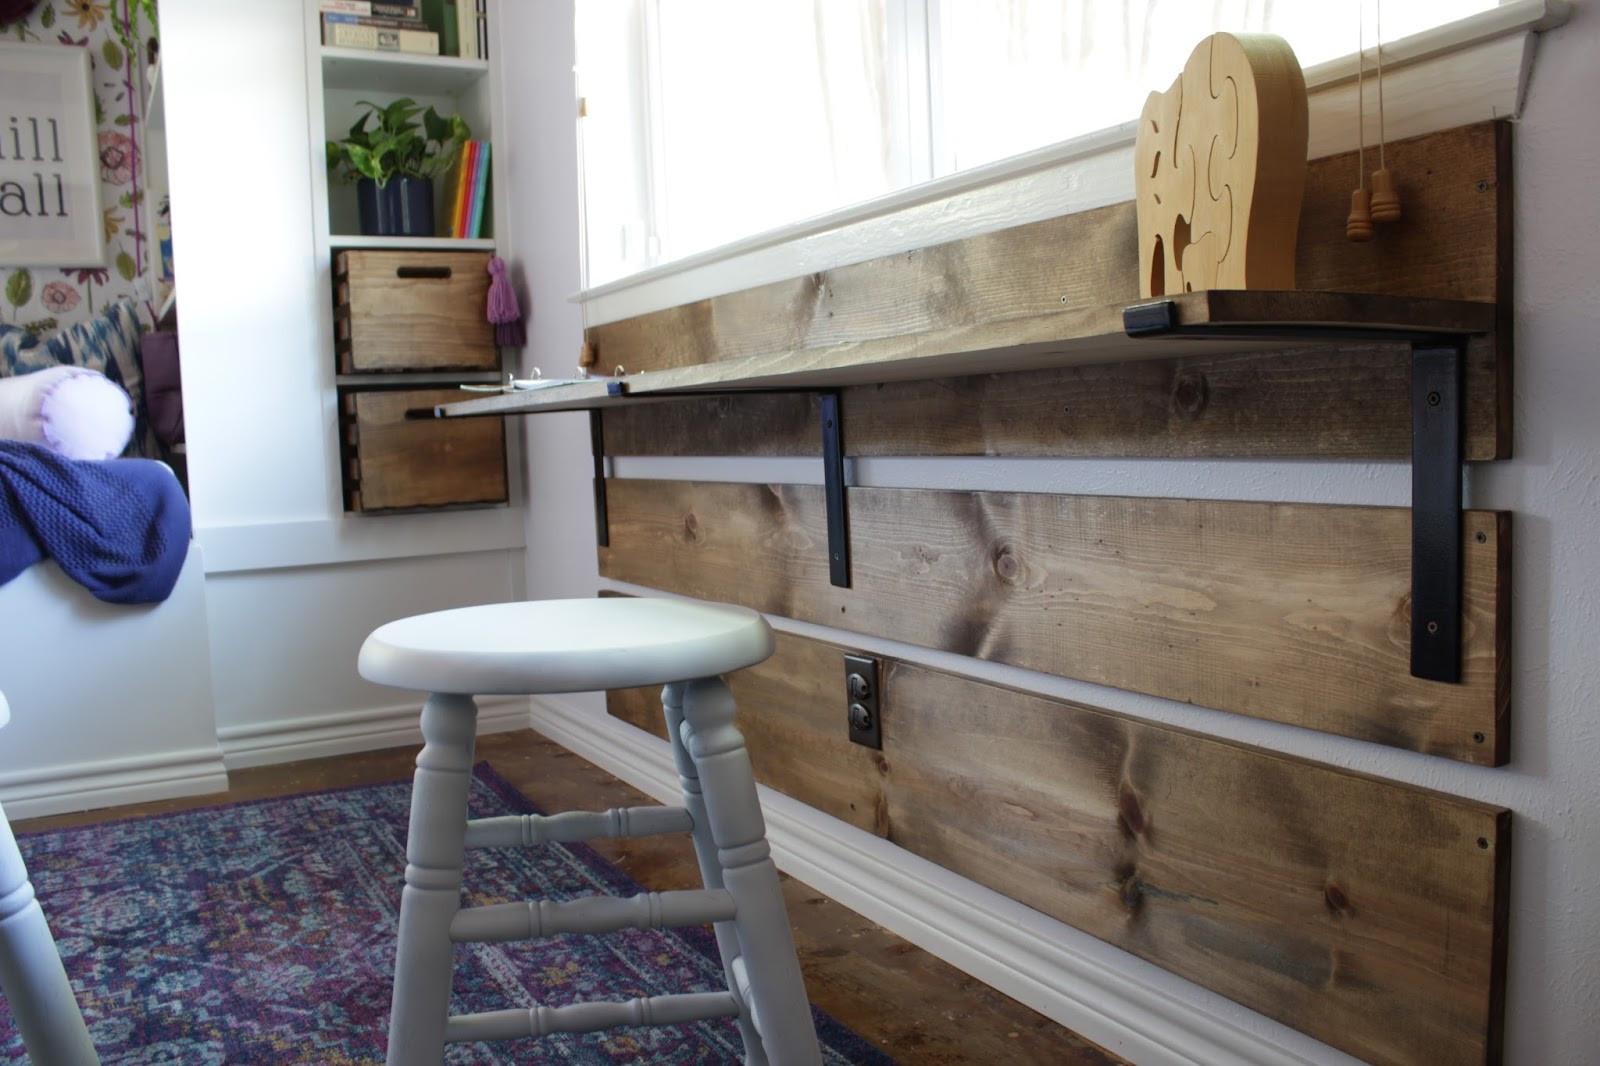 Best ideas about DIY Shelf Brackets . Save or Pin House Homemade DIY Kids Desk with Shelf Brackets Now.